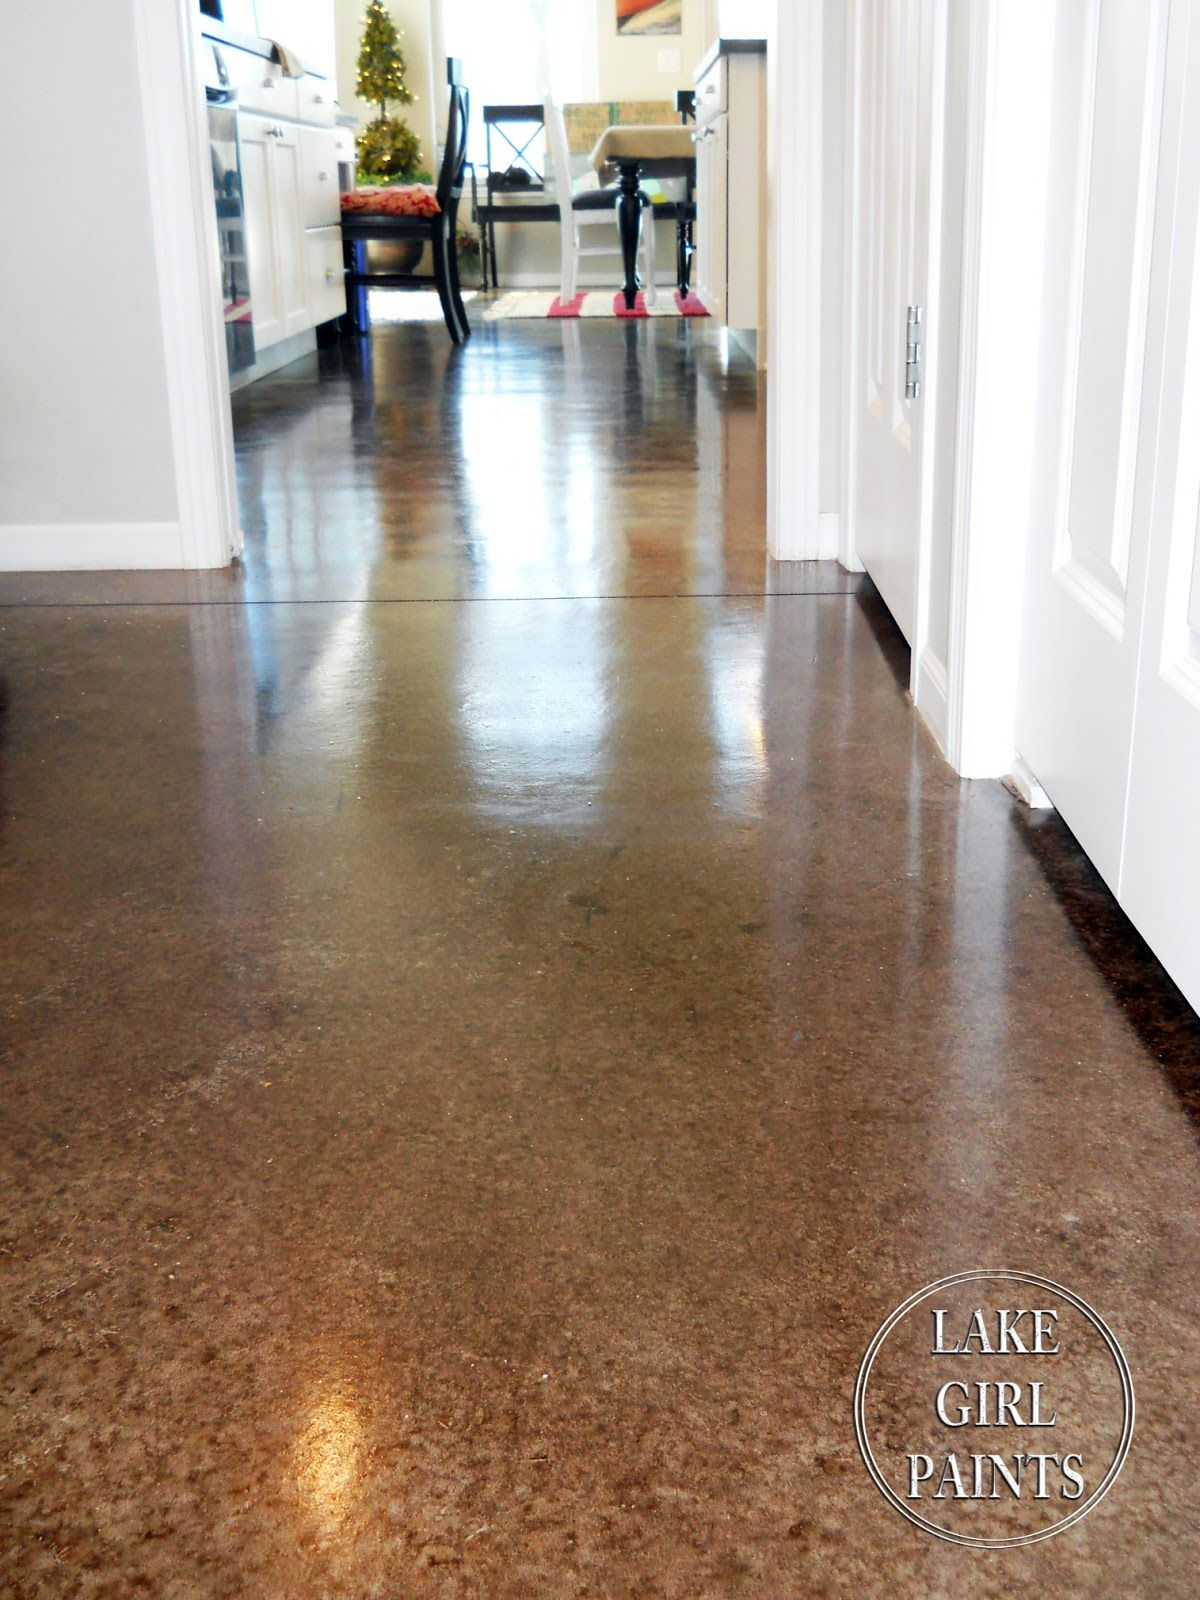 Lake Living In Nebraska Home Tour Debbiedoo S Concrete Stained Floors Painted Concrete Floors Concrete Floors